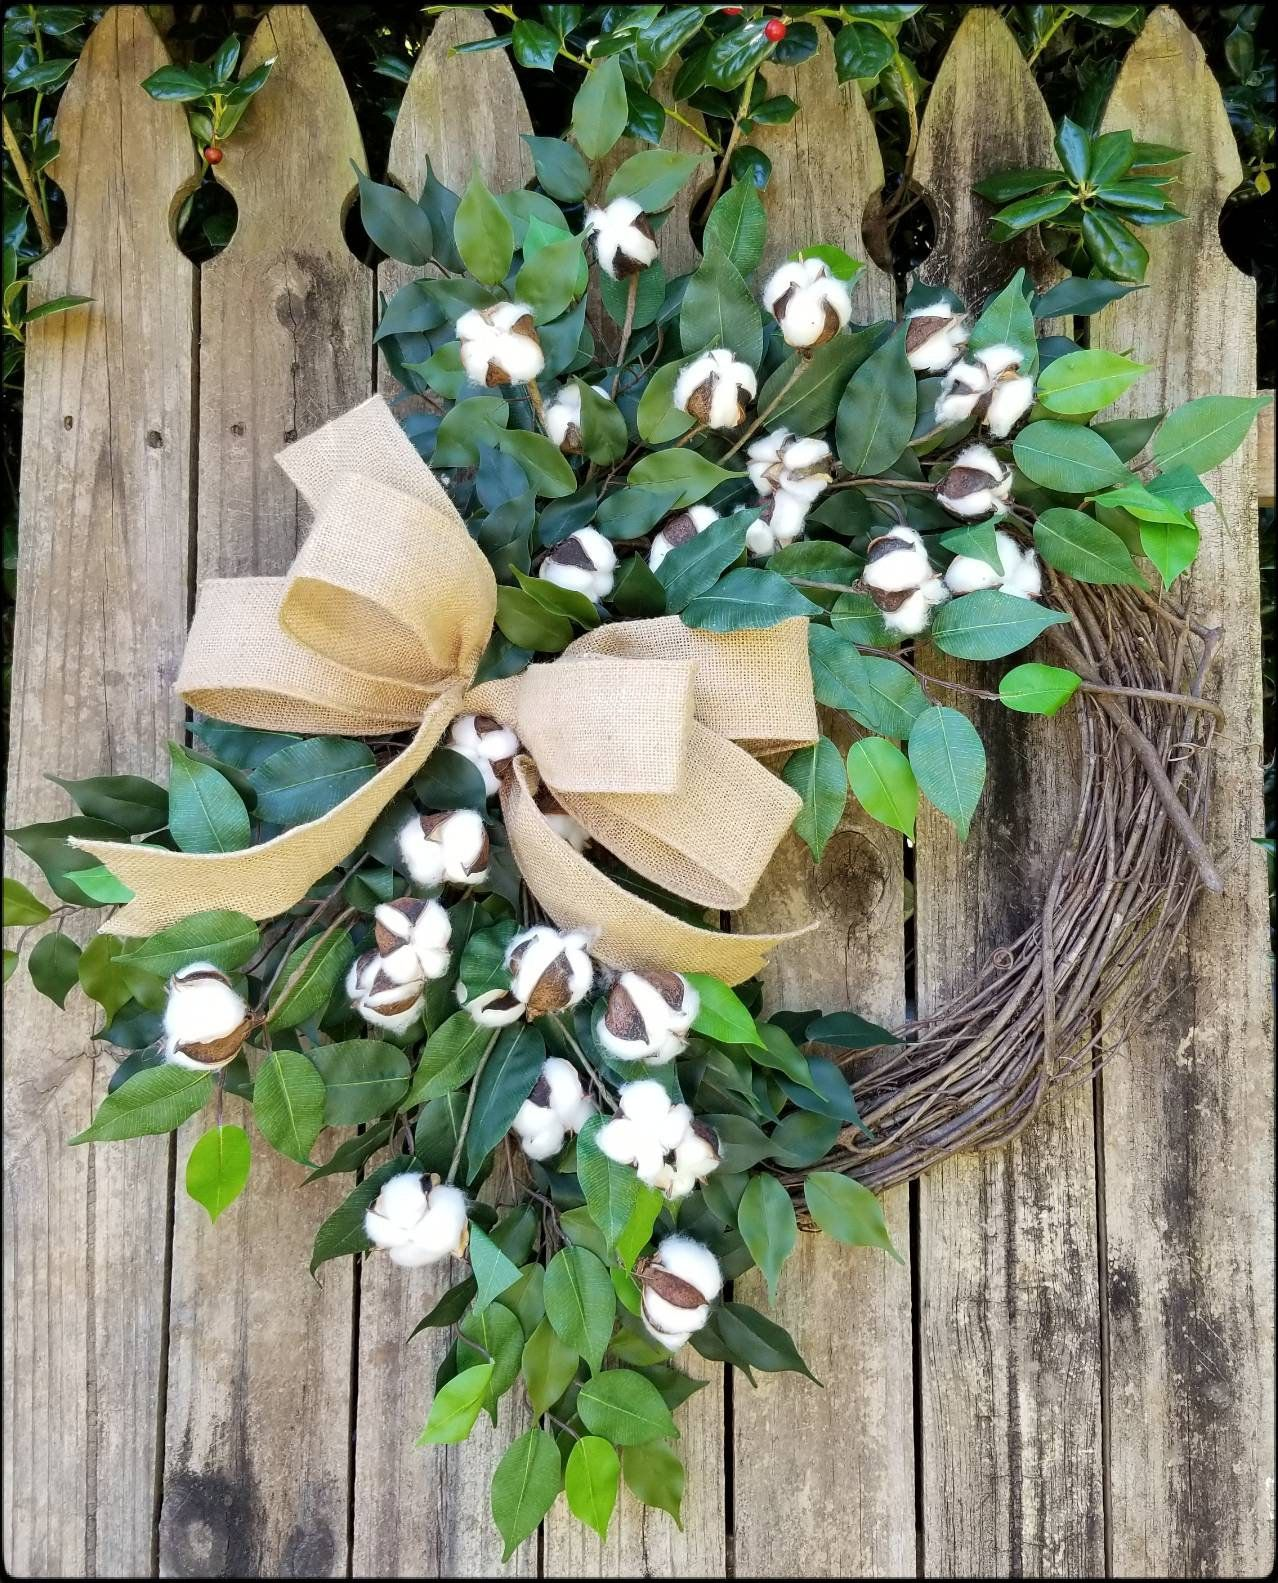 Cotton farmhouse style grapevine wreath rustic year round